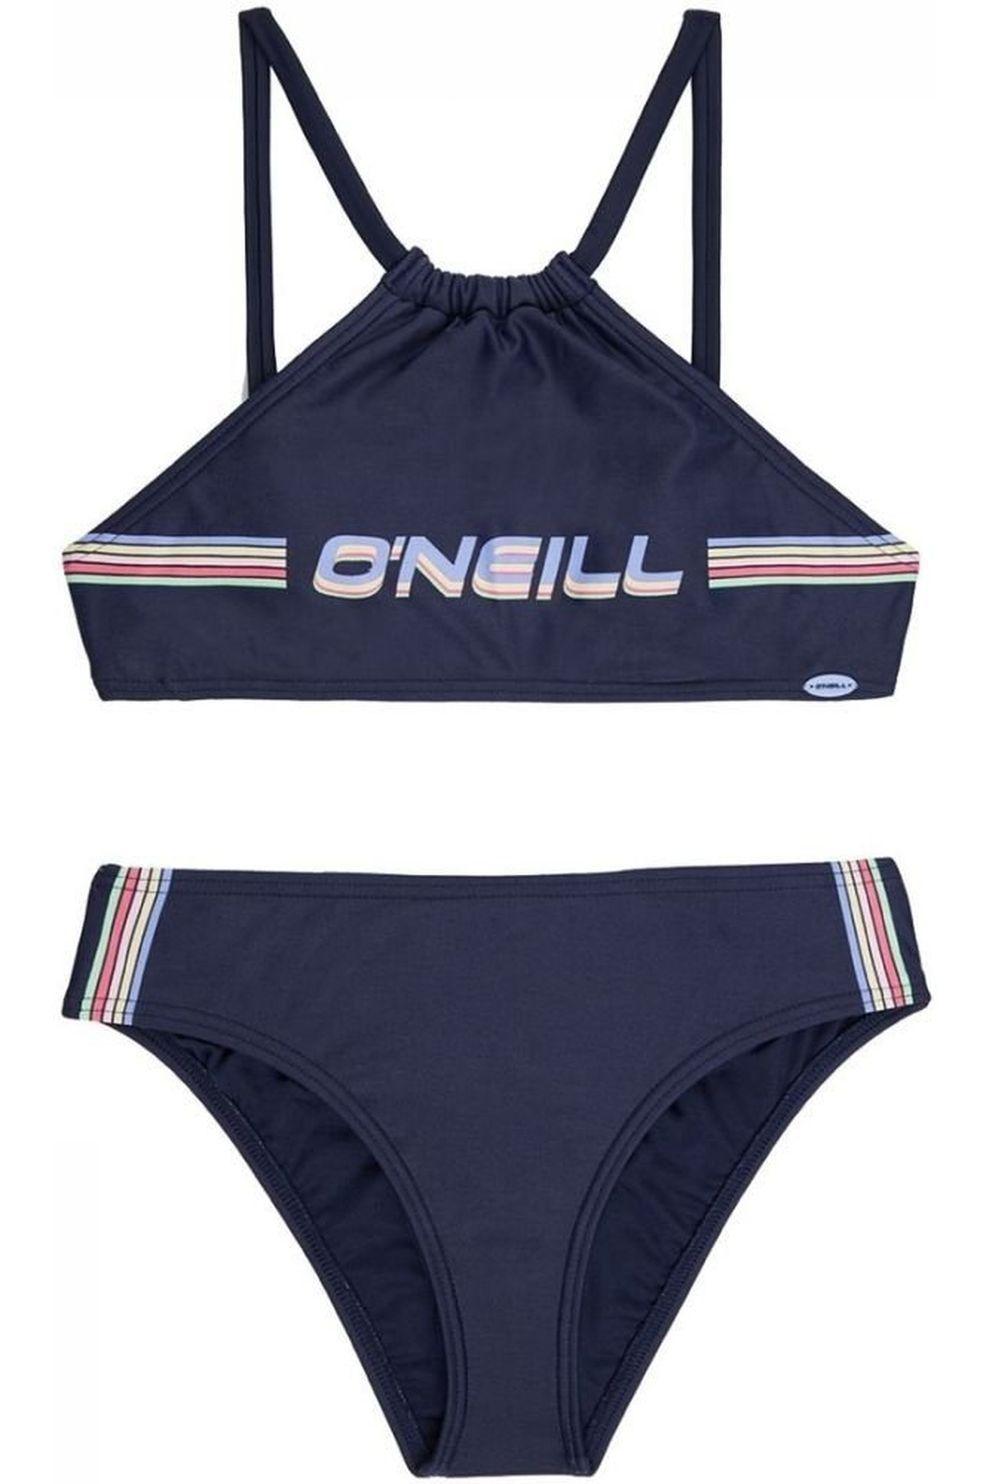 O'Neill Bikini Pg Cali Holiday voor meisjes - Blauw - Maat: 176